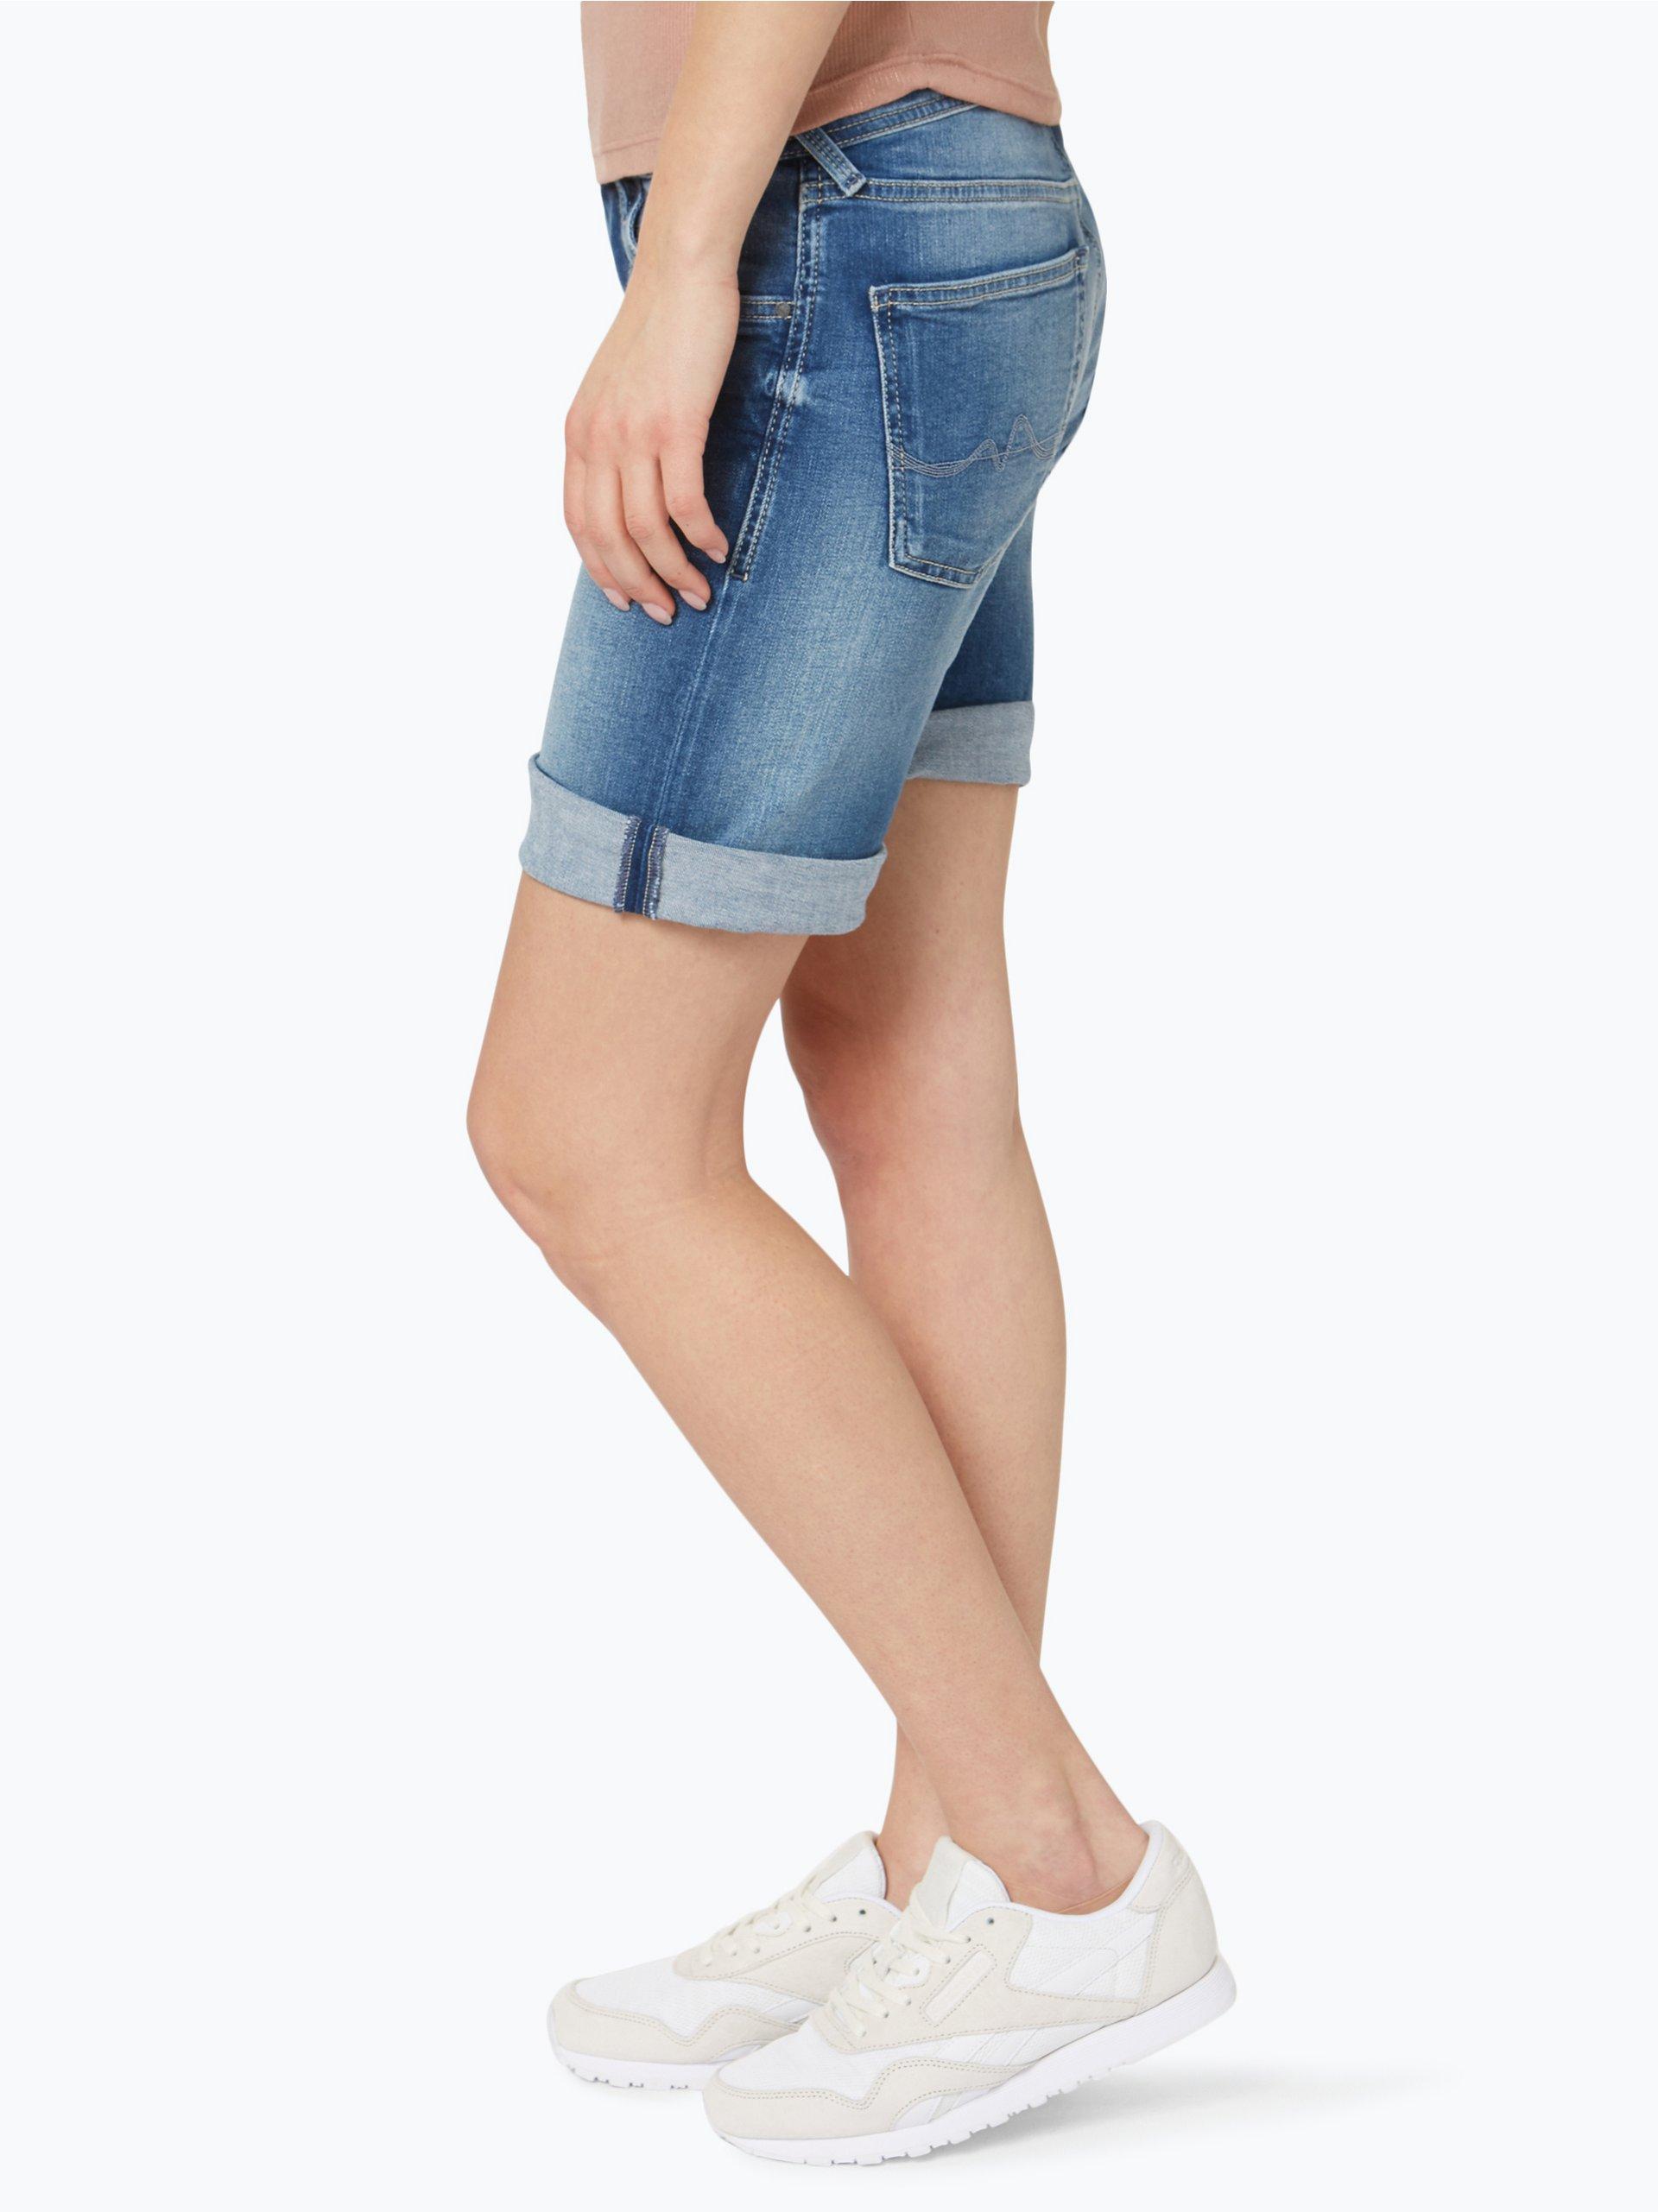 pepe jeans damen shorts poppy 2 online kaufen peek und cloppenburg de. Black Bedroom Furniture Sets. Home Design Ideas